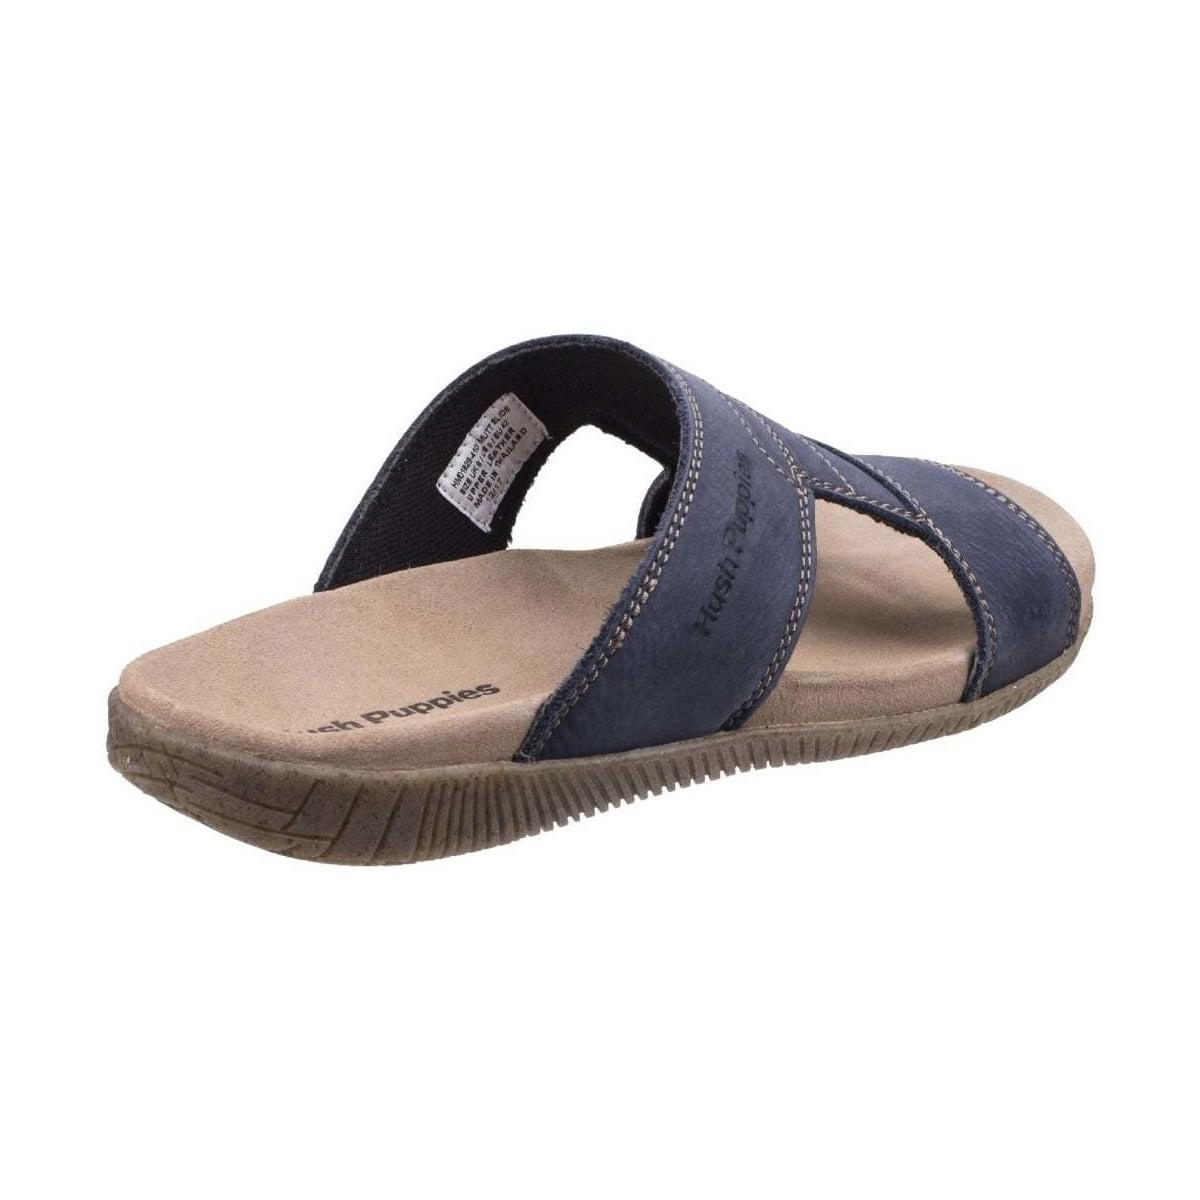 62bc28c534b0 Hush Puppies - Mutt Slider Mens Sandals Men s Sandals In Blue for Men -  Lyst. View fullscreen